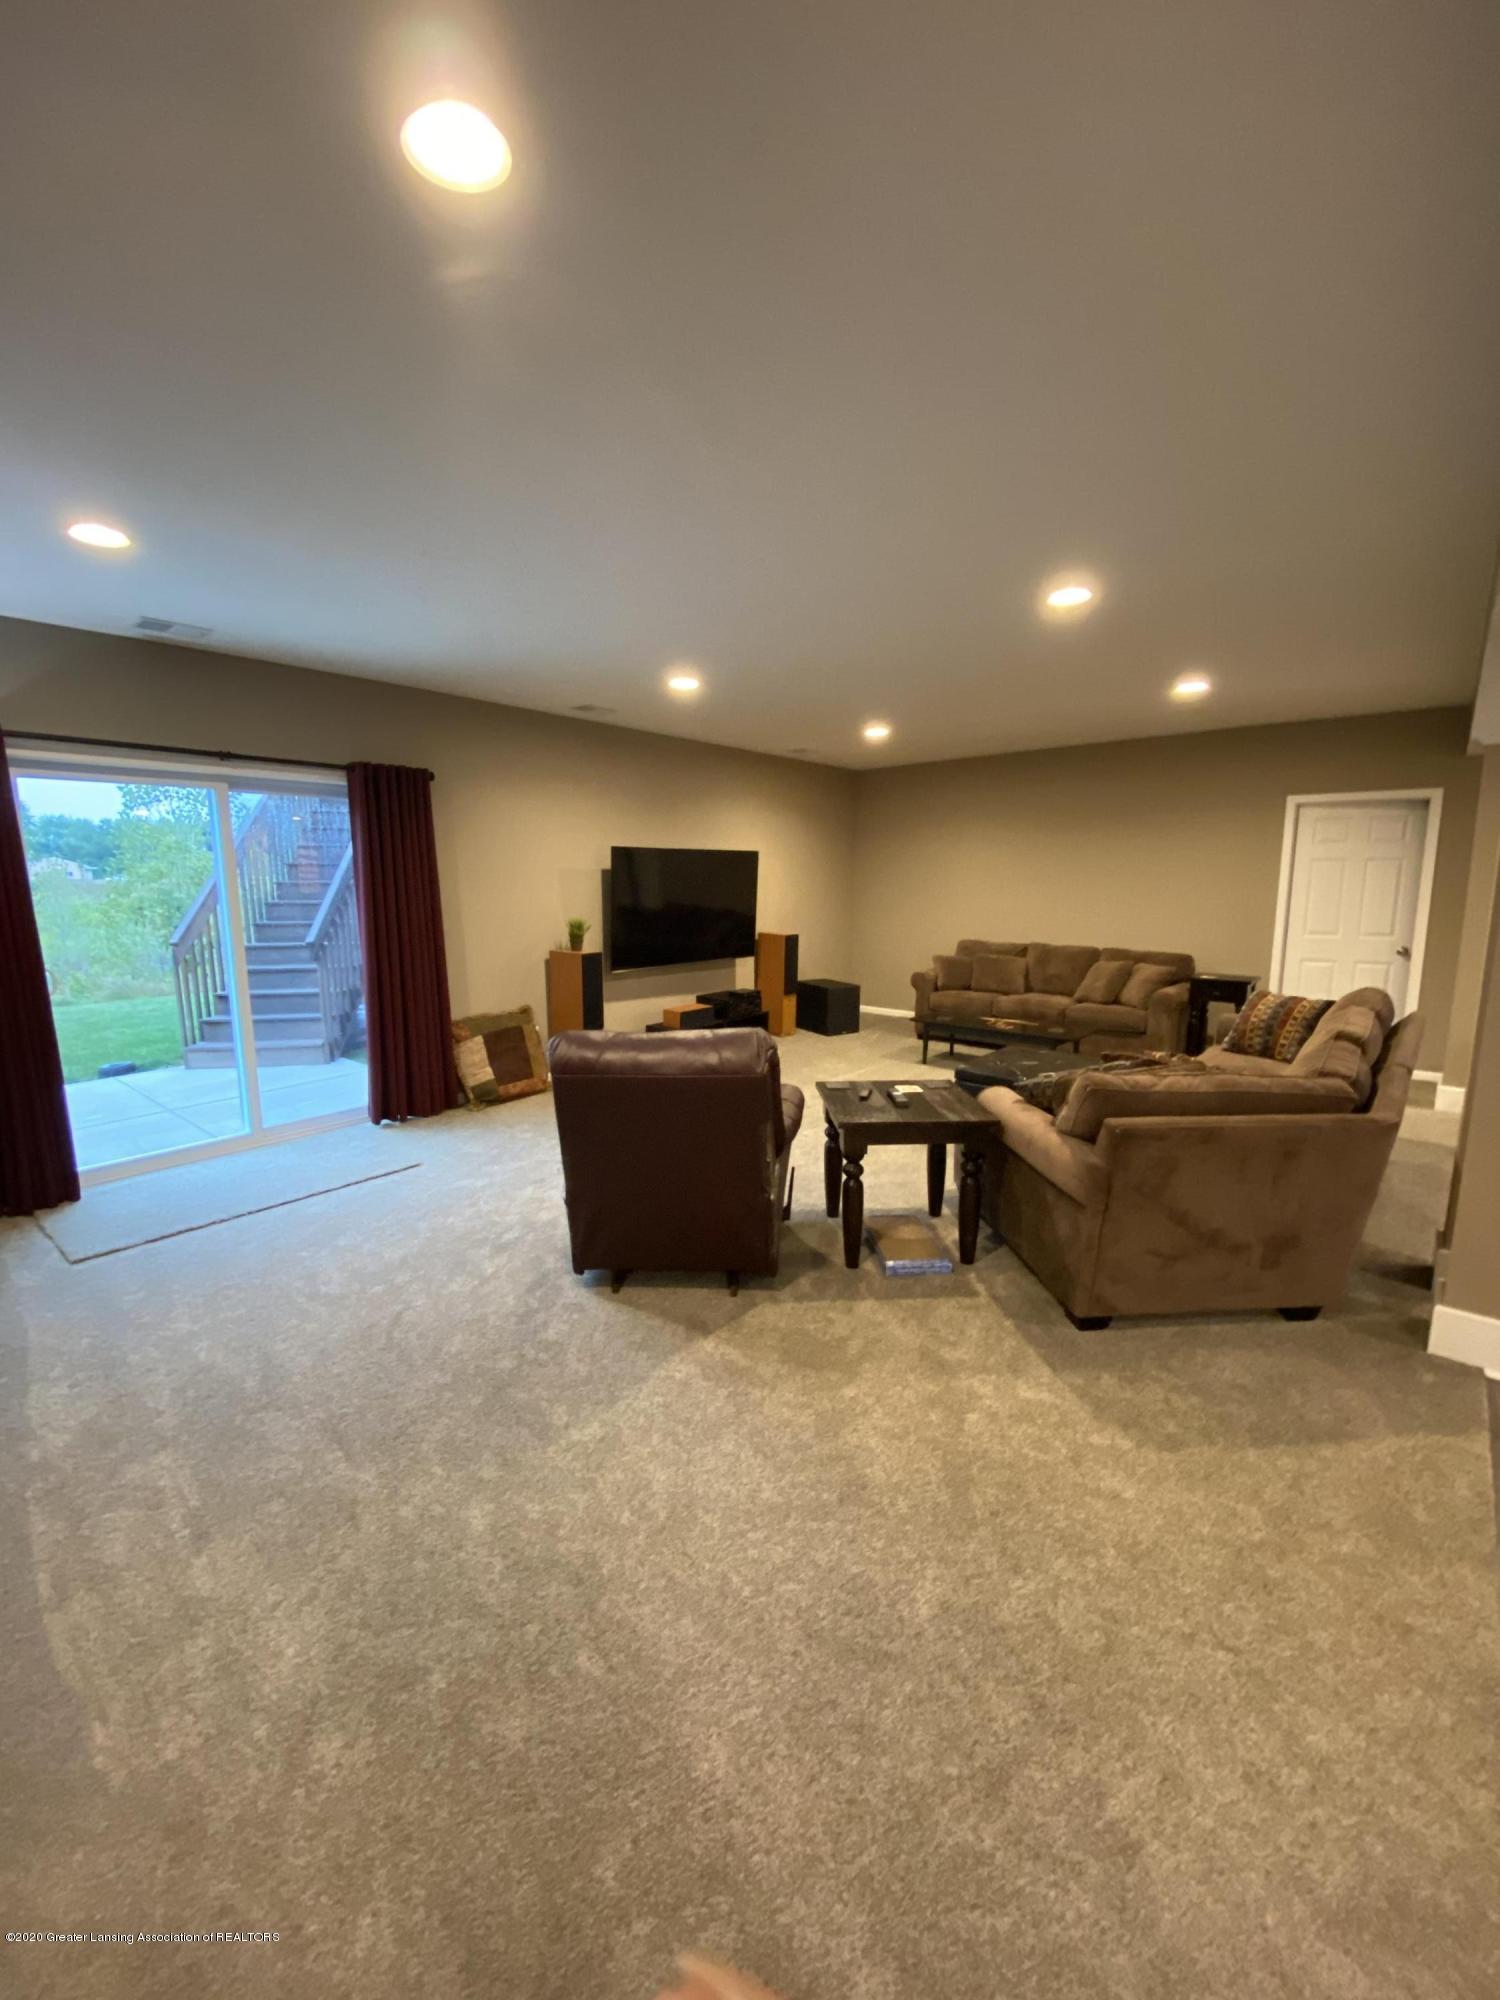 1204 Verbena Ln - Lower level living area - 28